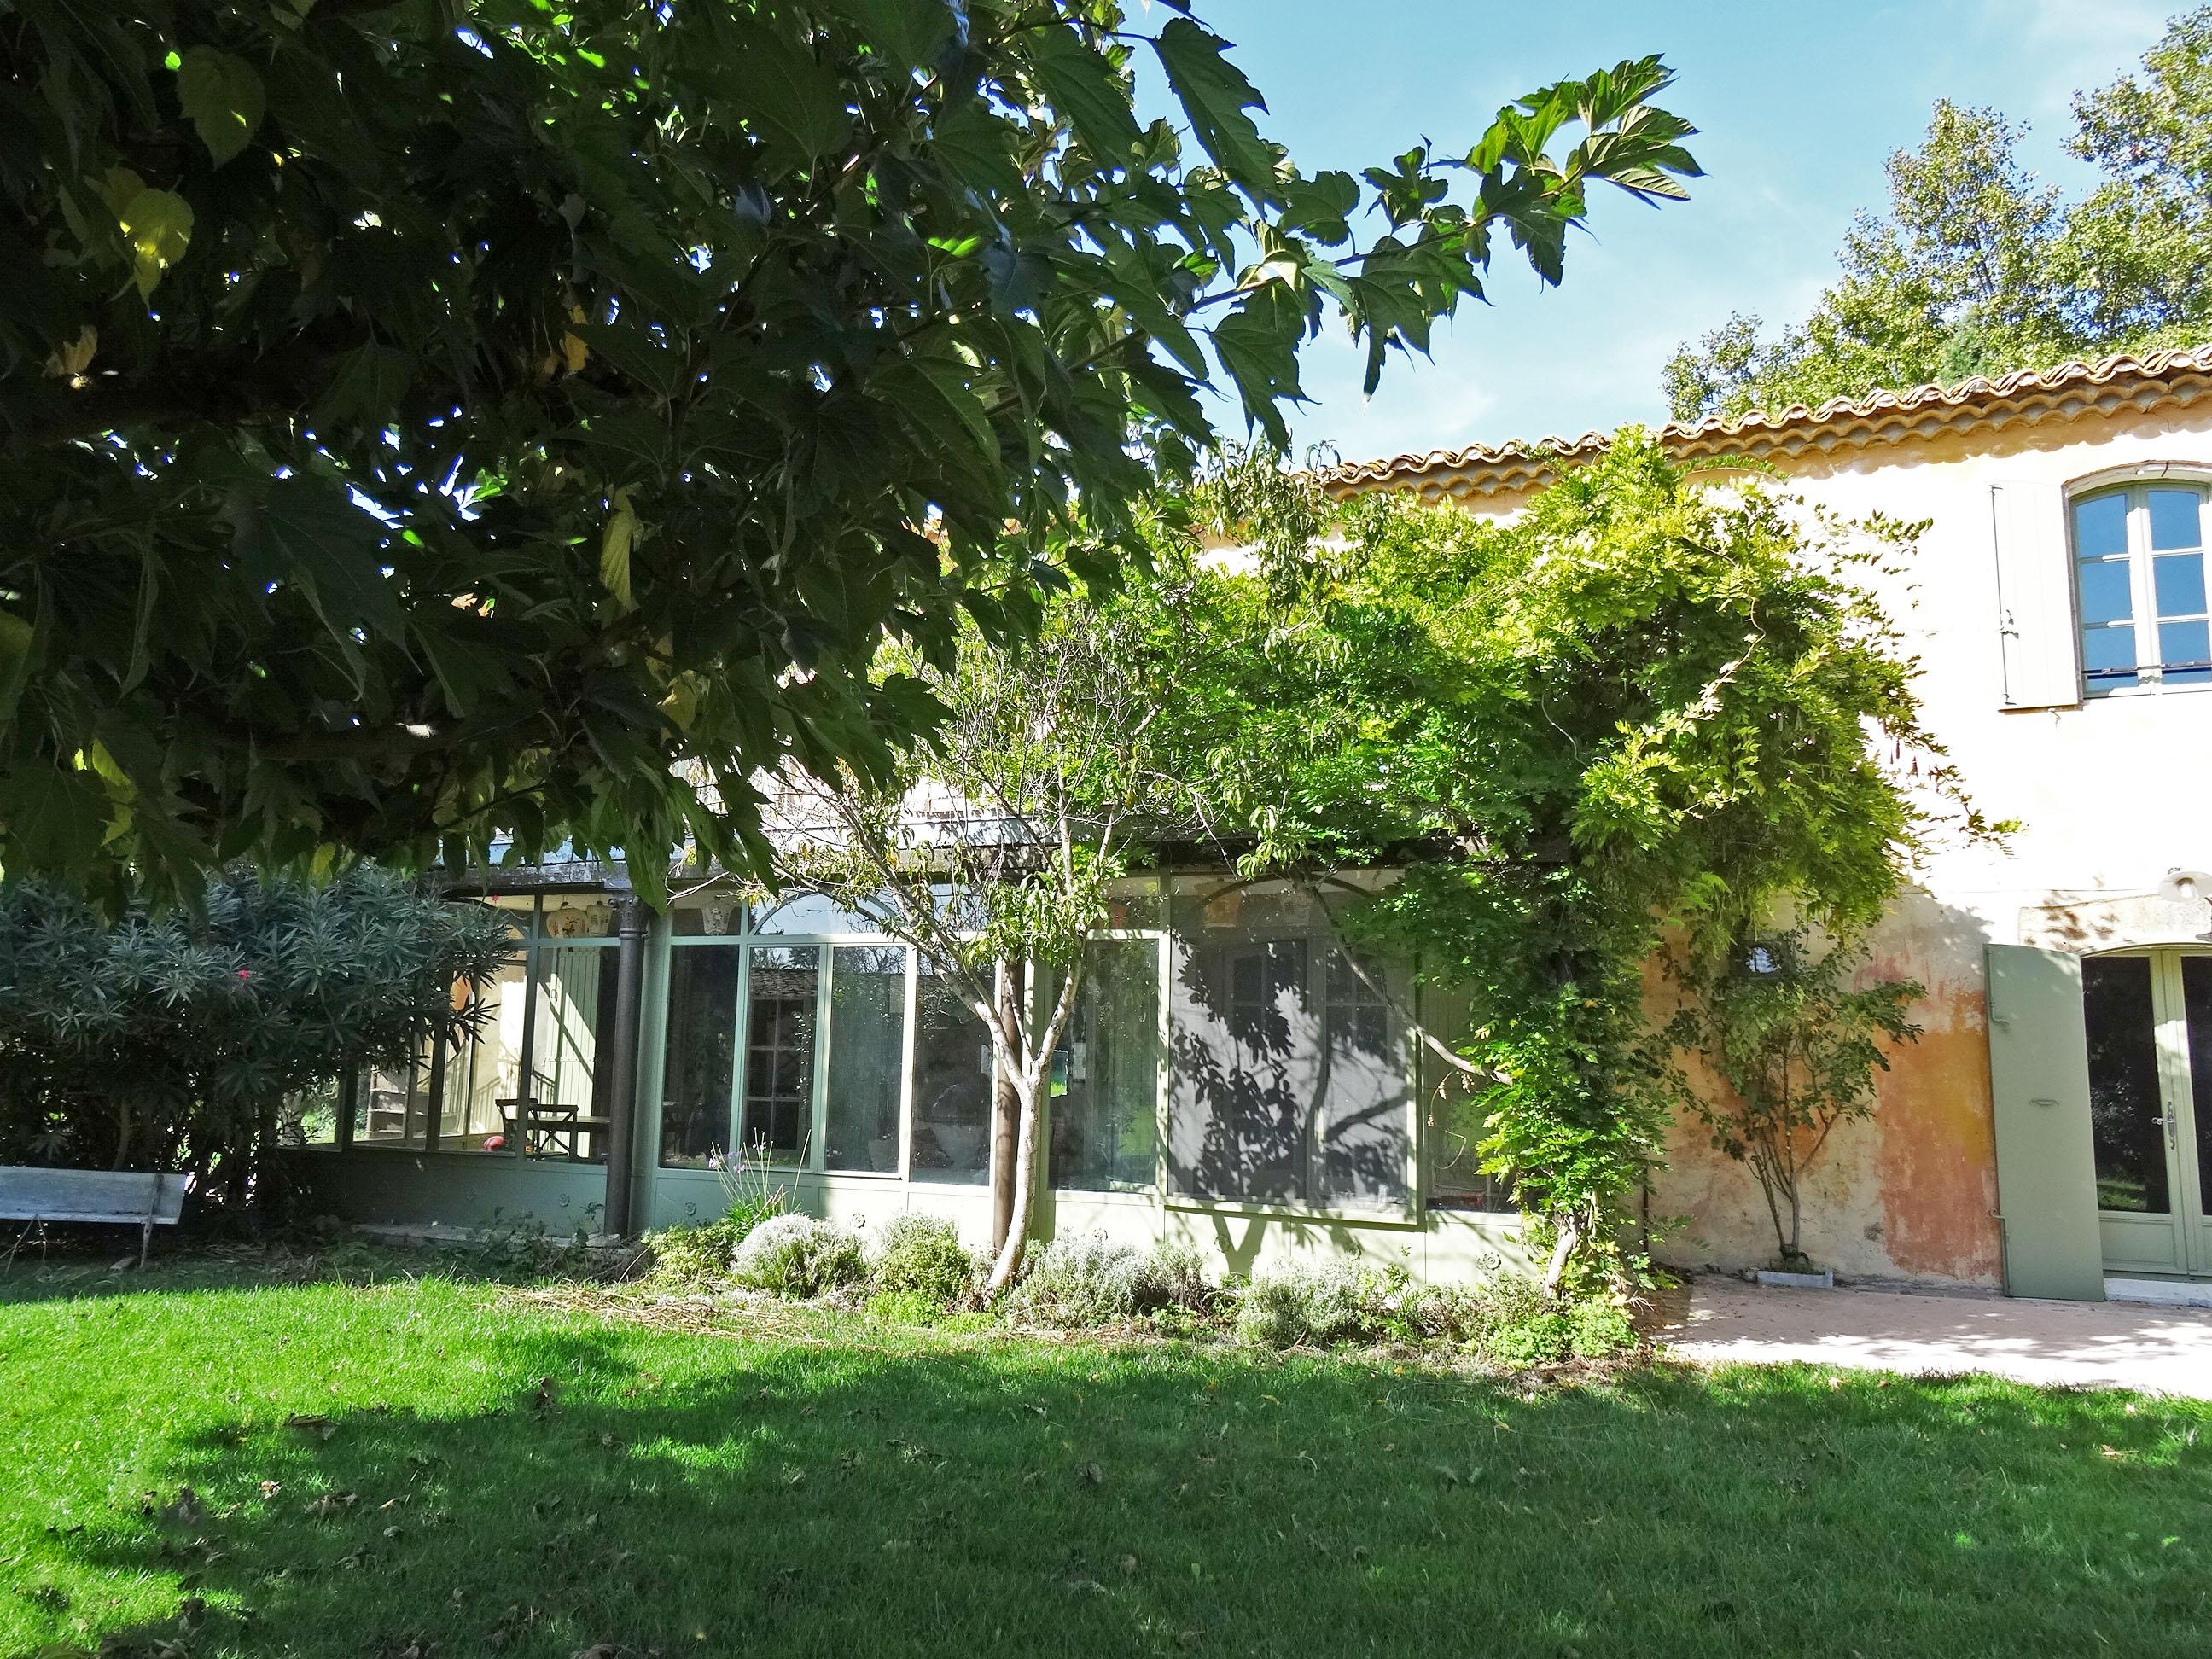 Farm / Ranch / Plantation for Sale at Typical provencal farmhouse renovated in Provence Maussane Les Alpilles, Provence-Alpes-Cote D'Azur 13520 France